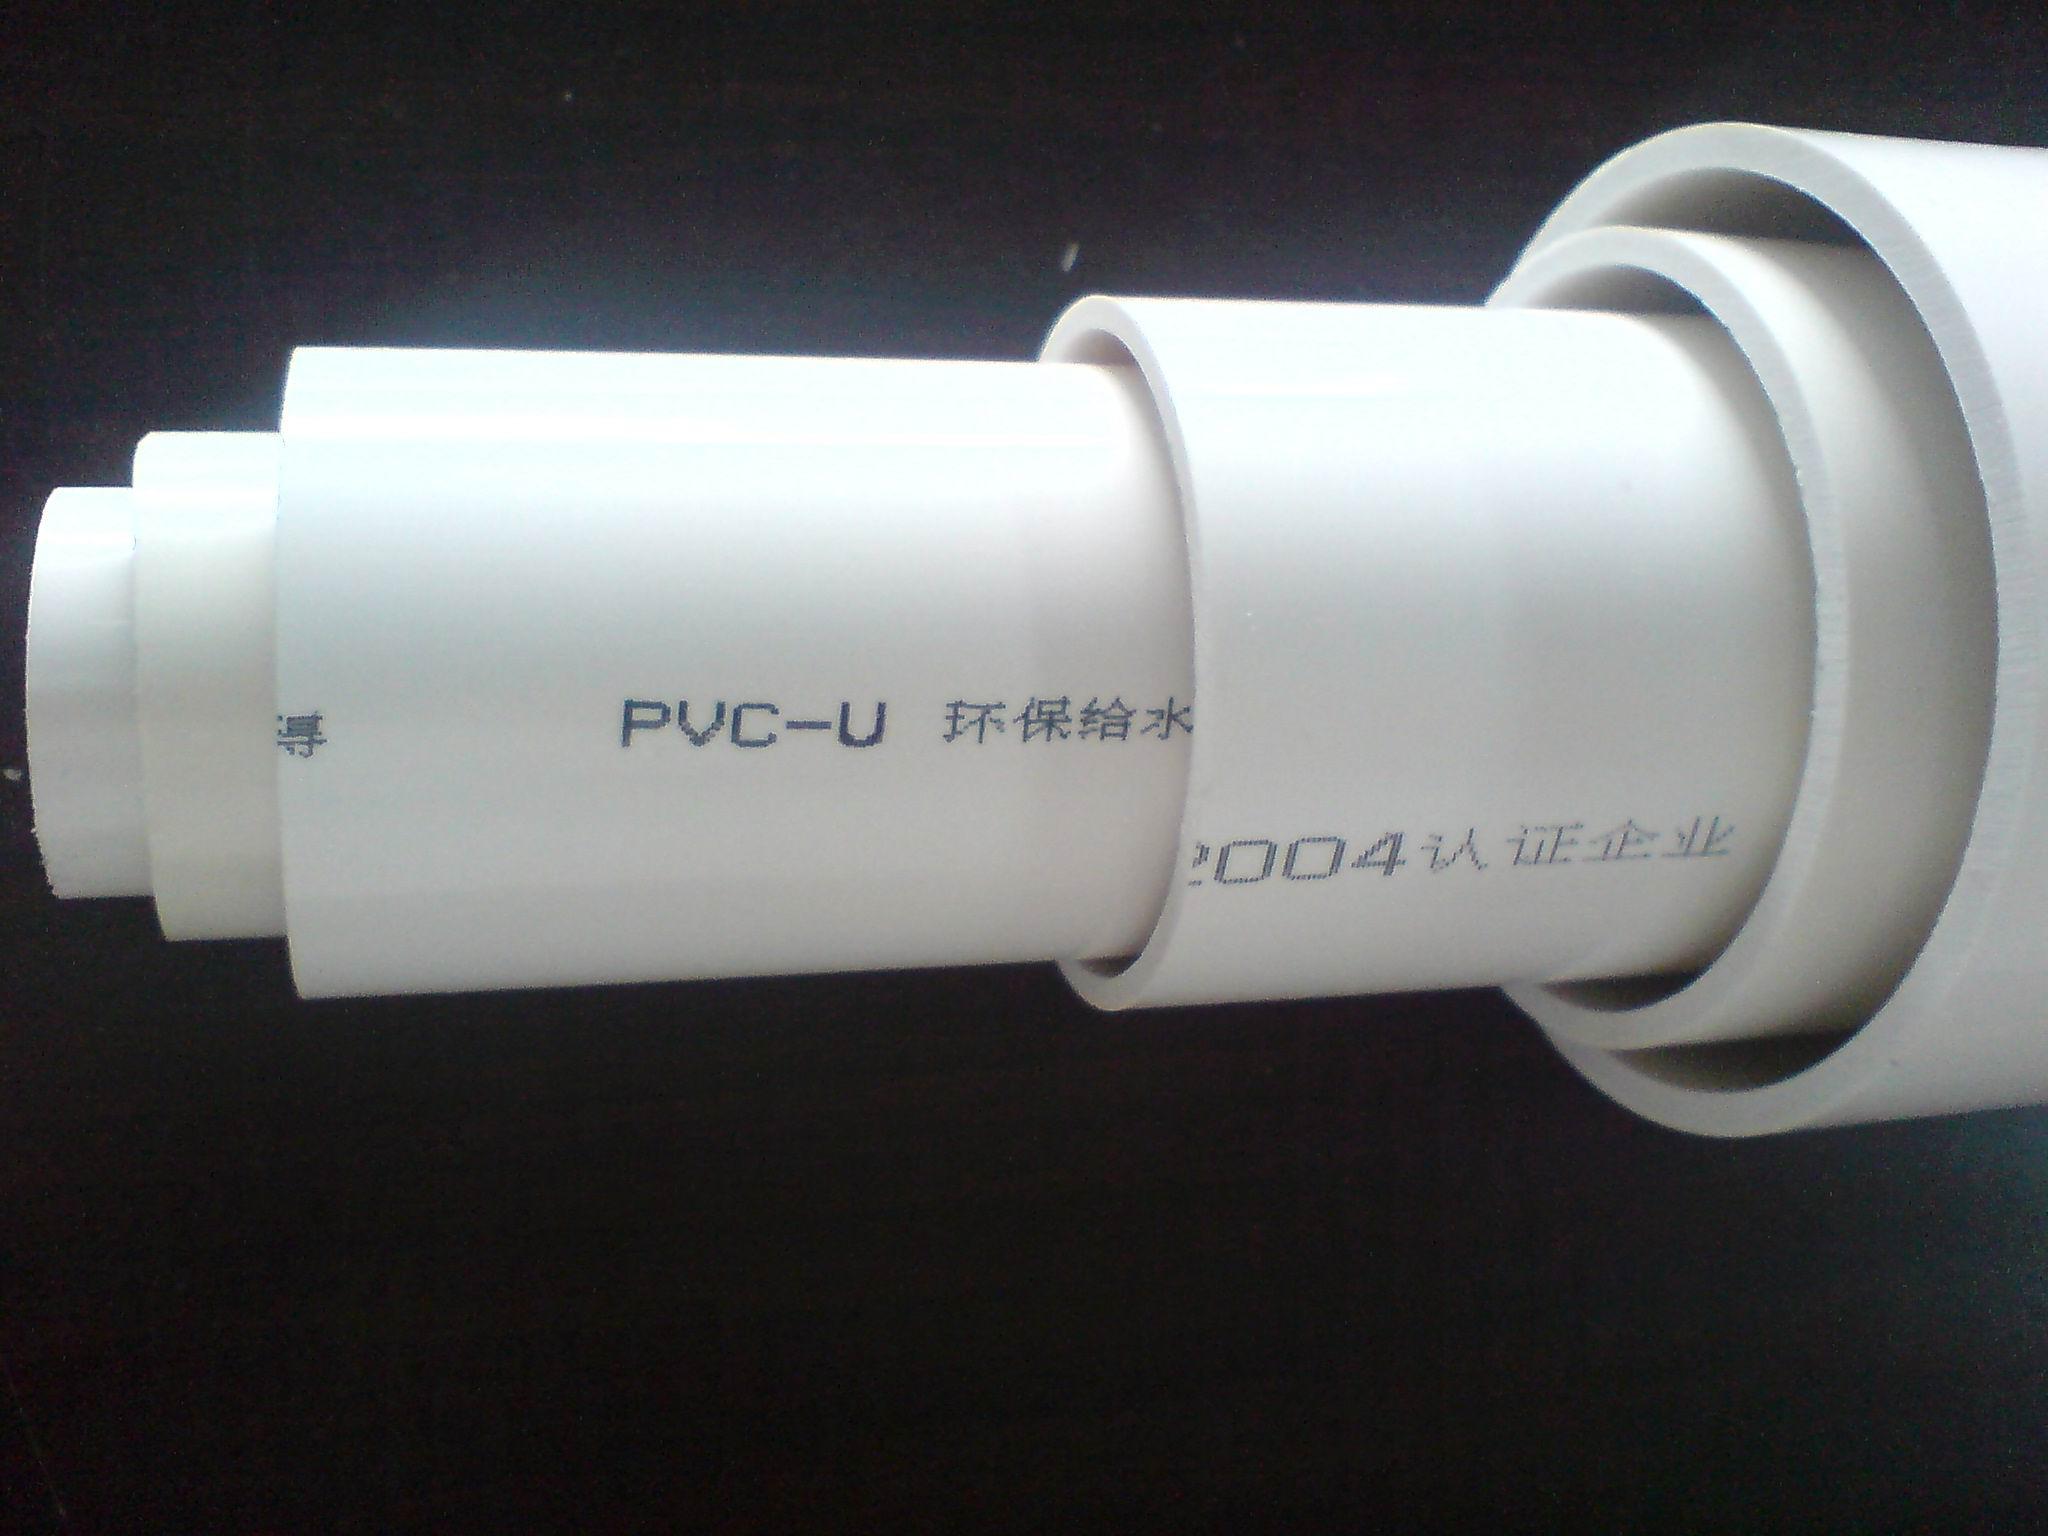 PVC-U排水管,排水管,管材,PP-R-详细说明:-PVC U排水管,